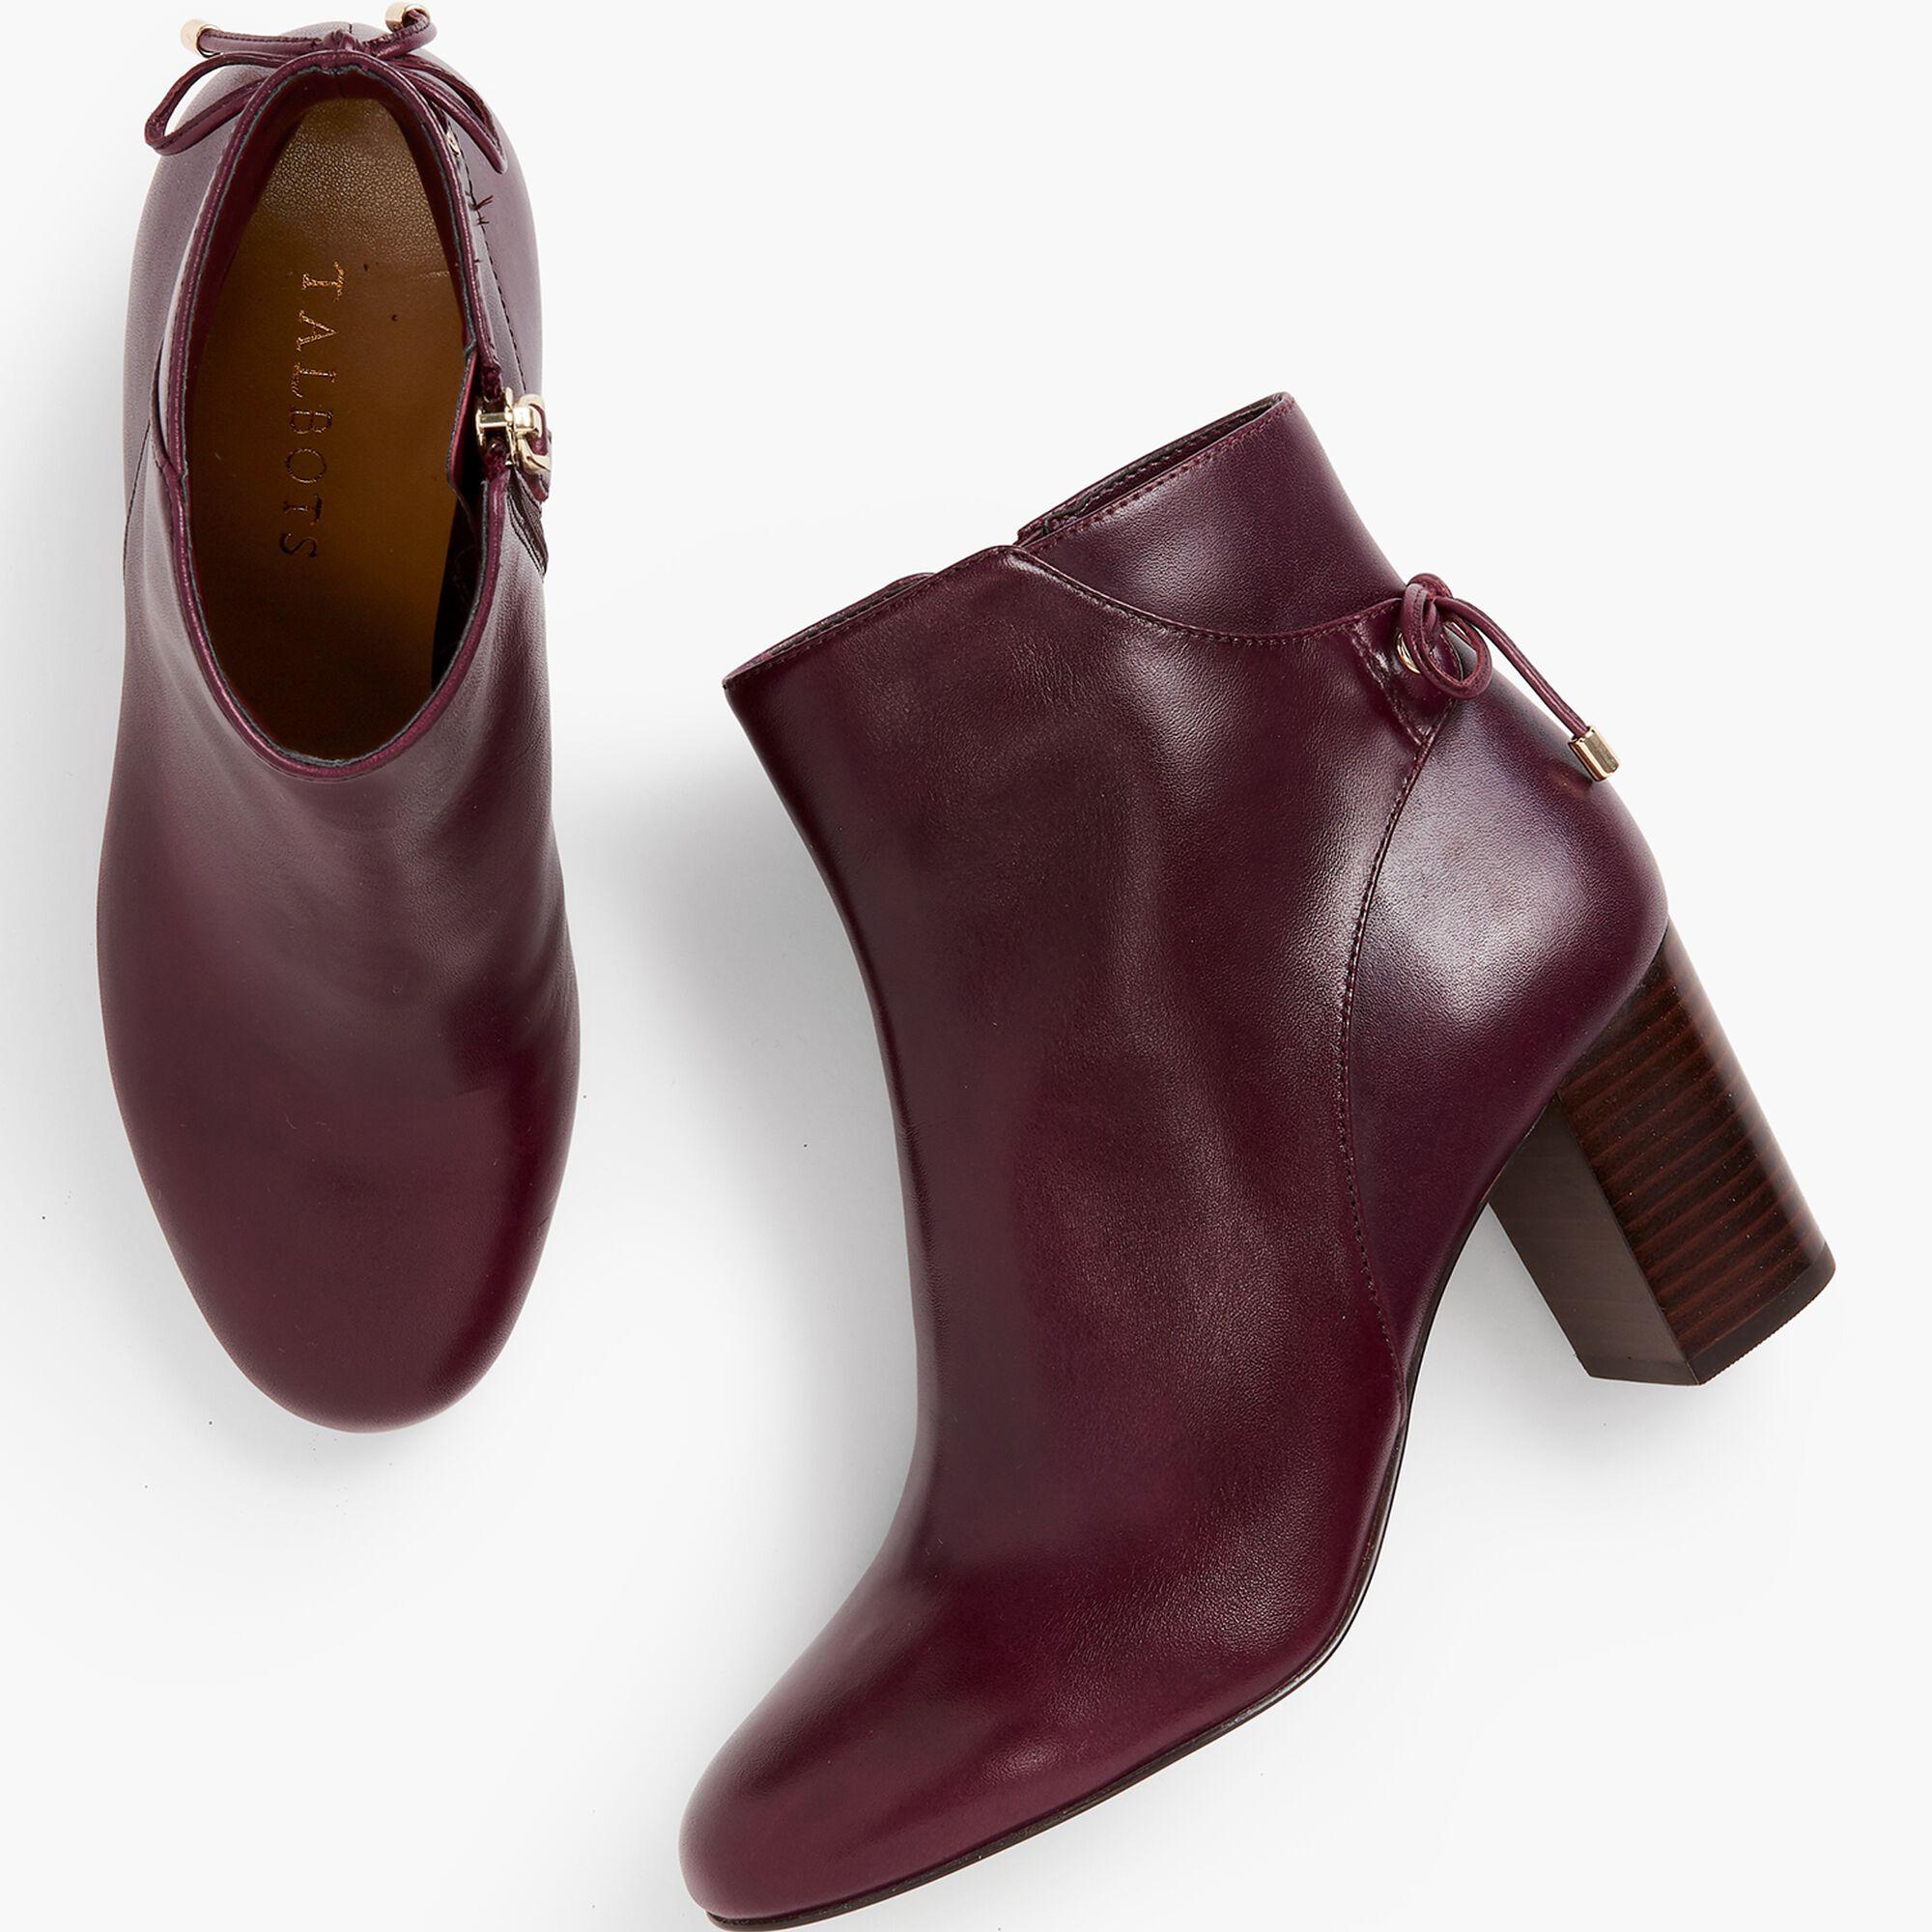 d25942f2cb0 Lilia Block-Heel Ankle Boots